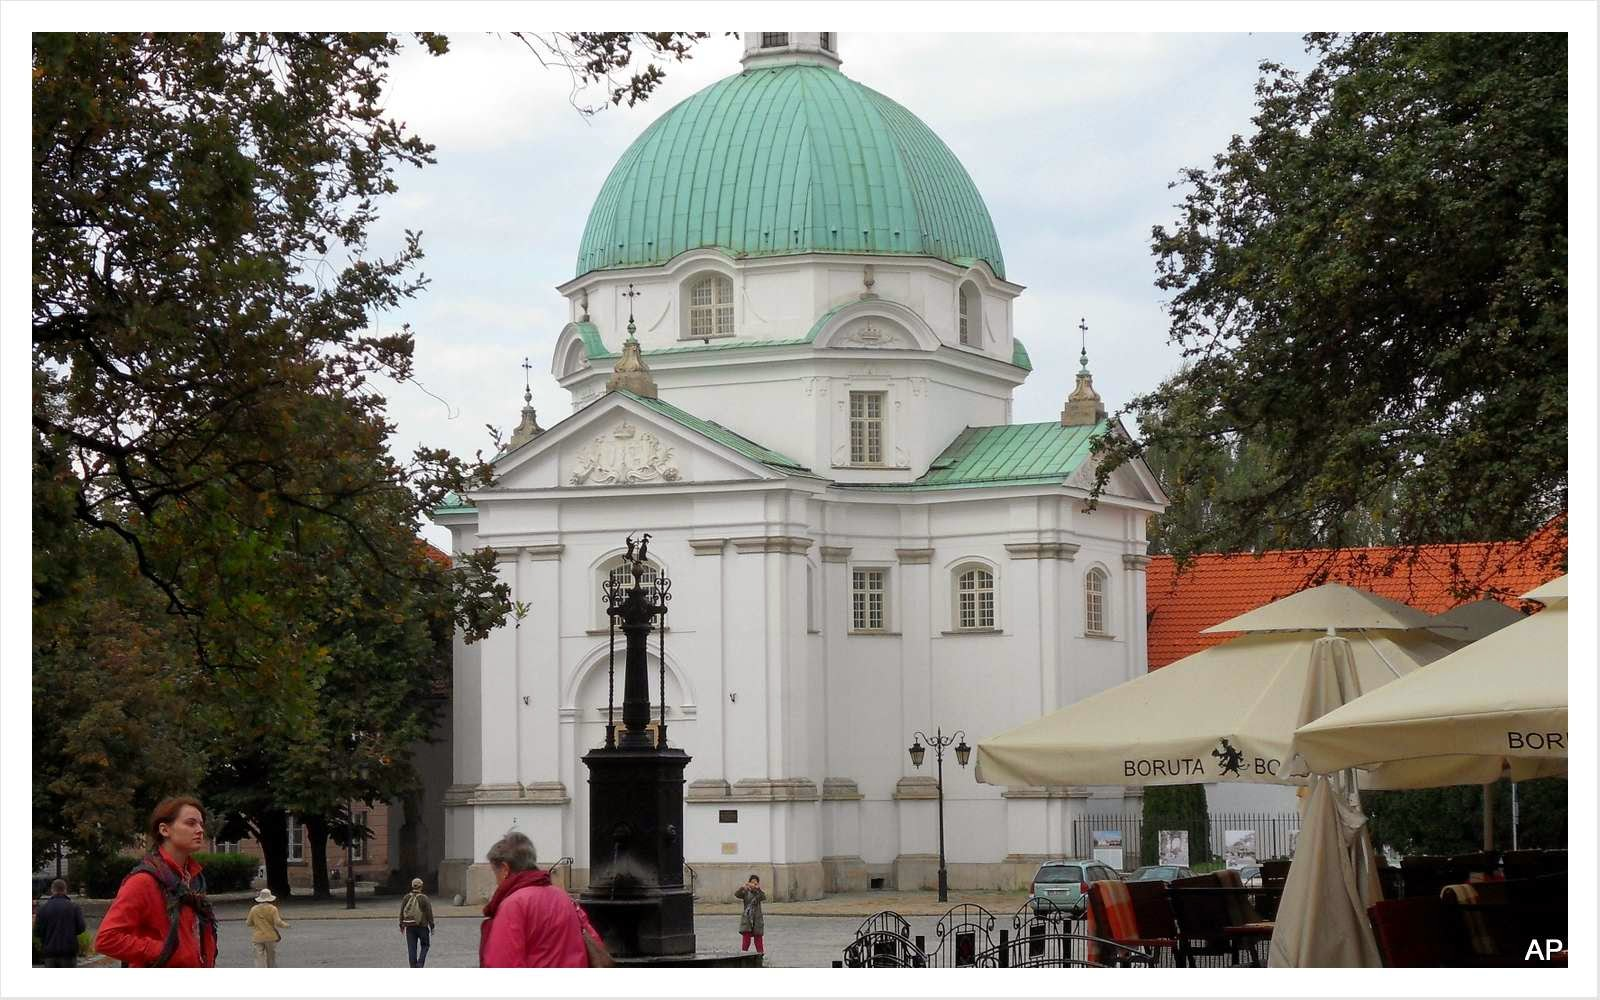 Neustädter Markt -St. Kasimir Kirche